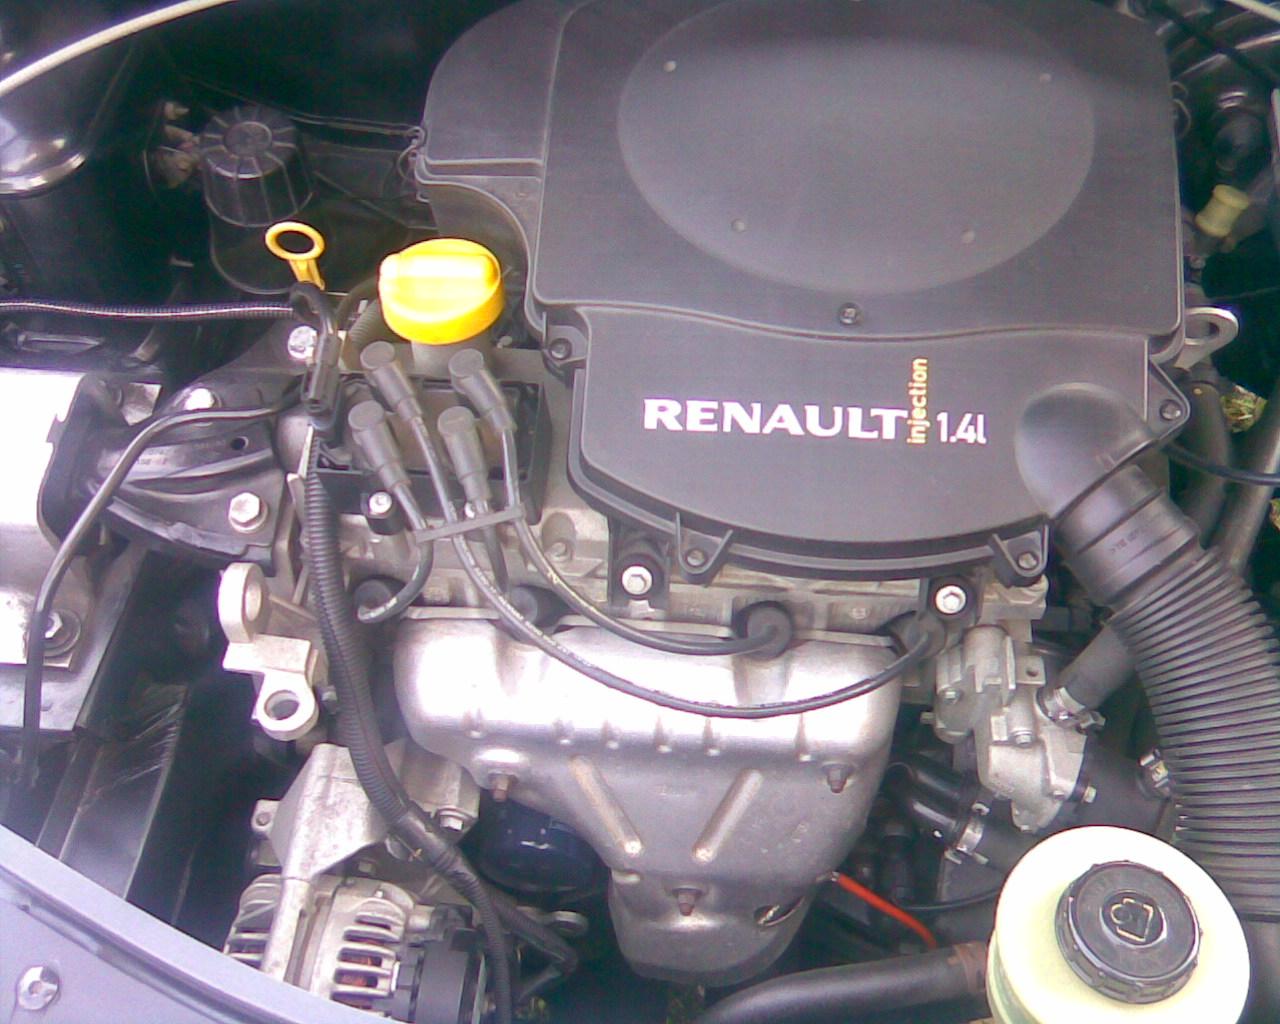 07896_motor1.4_122_9lo.jpg